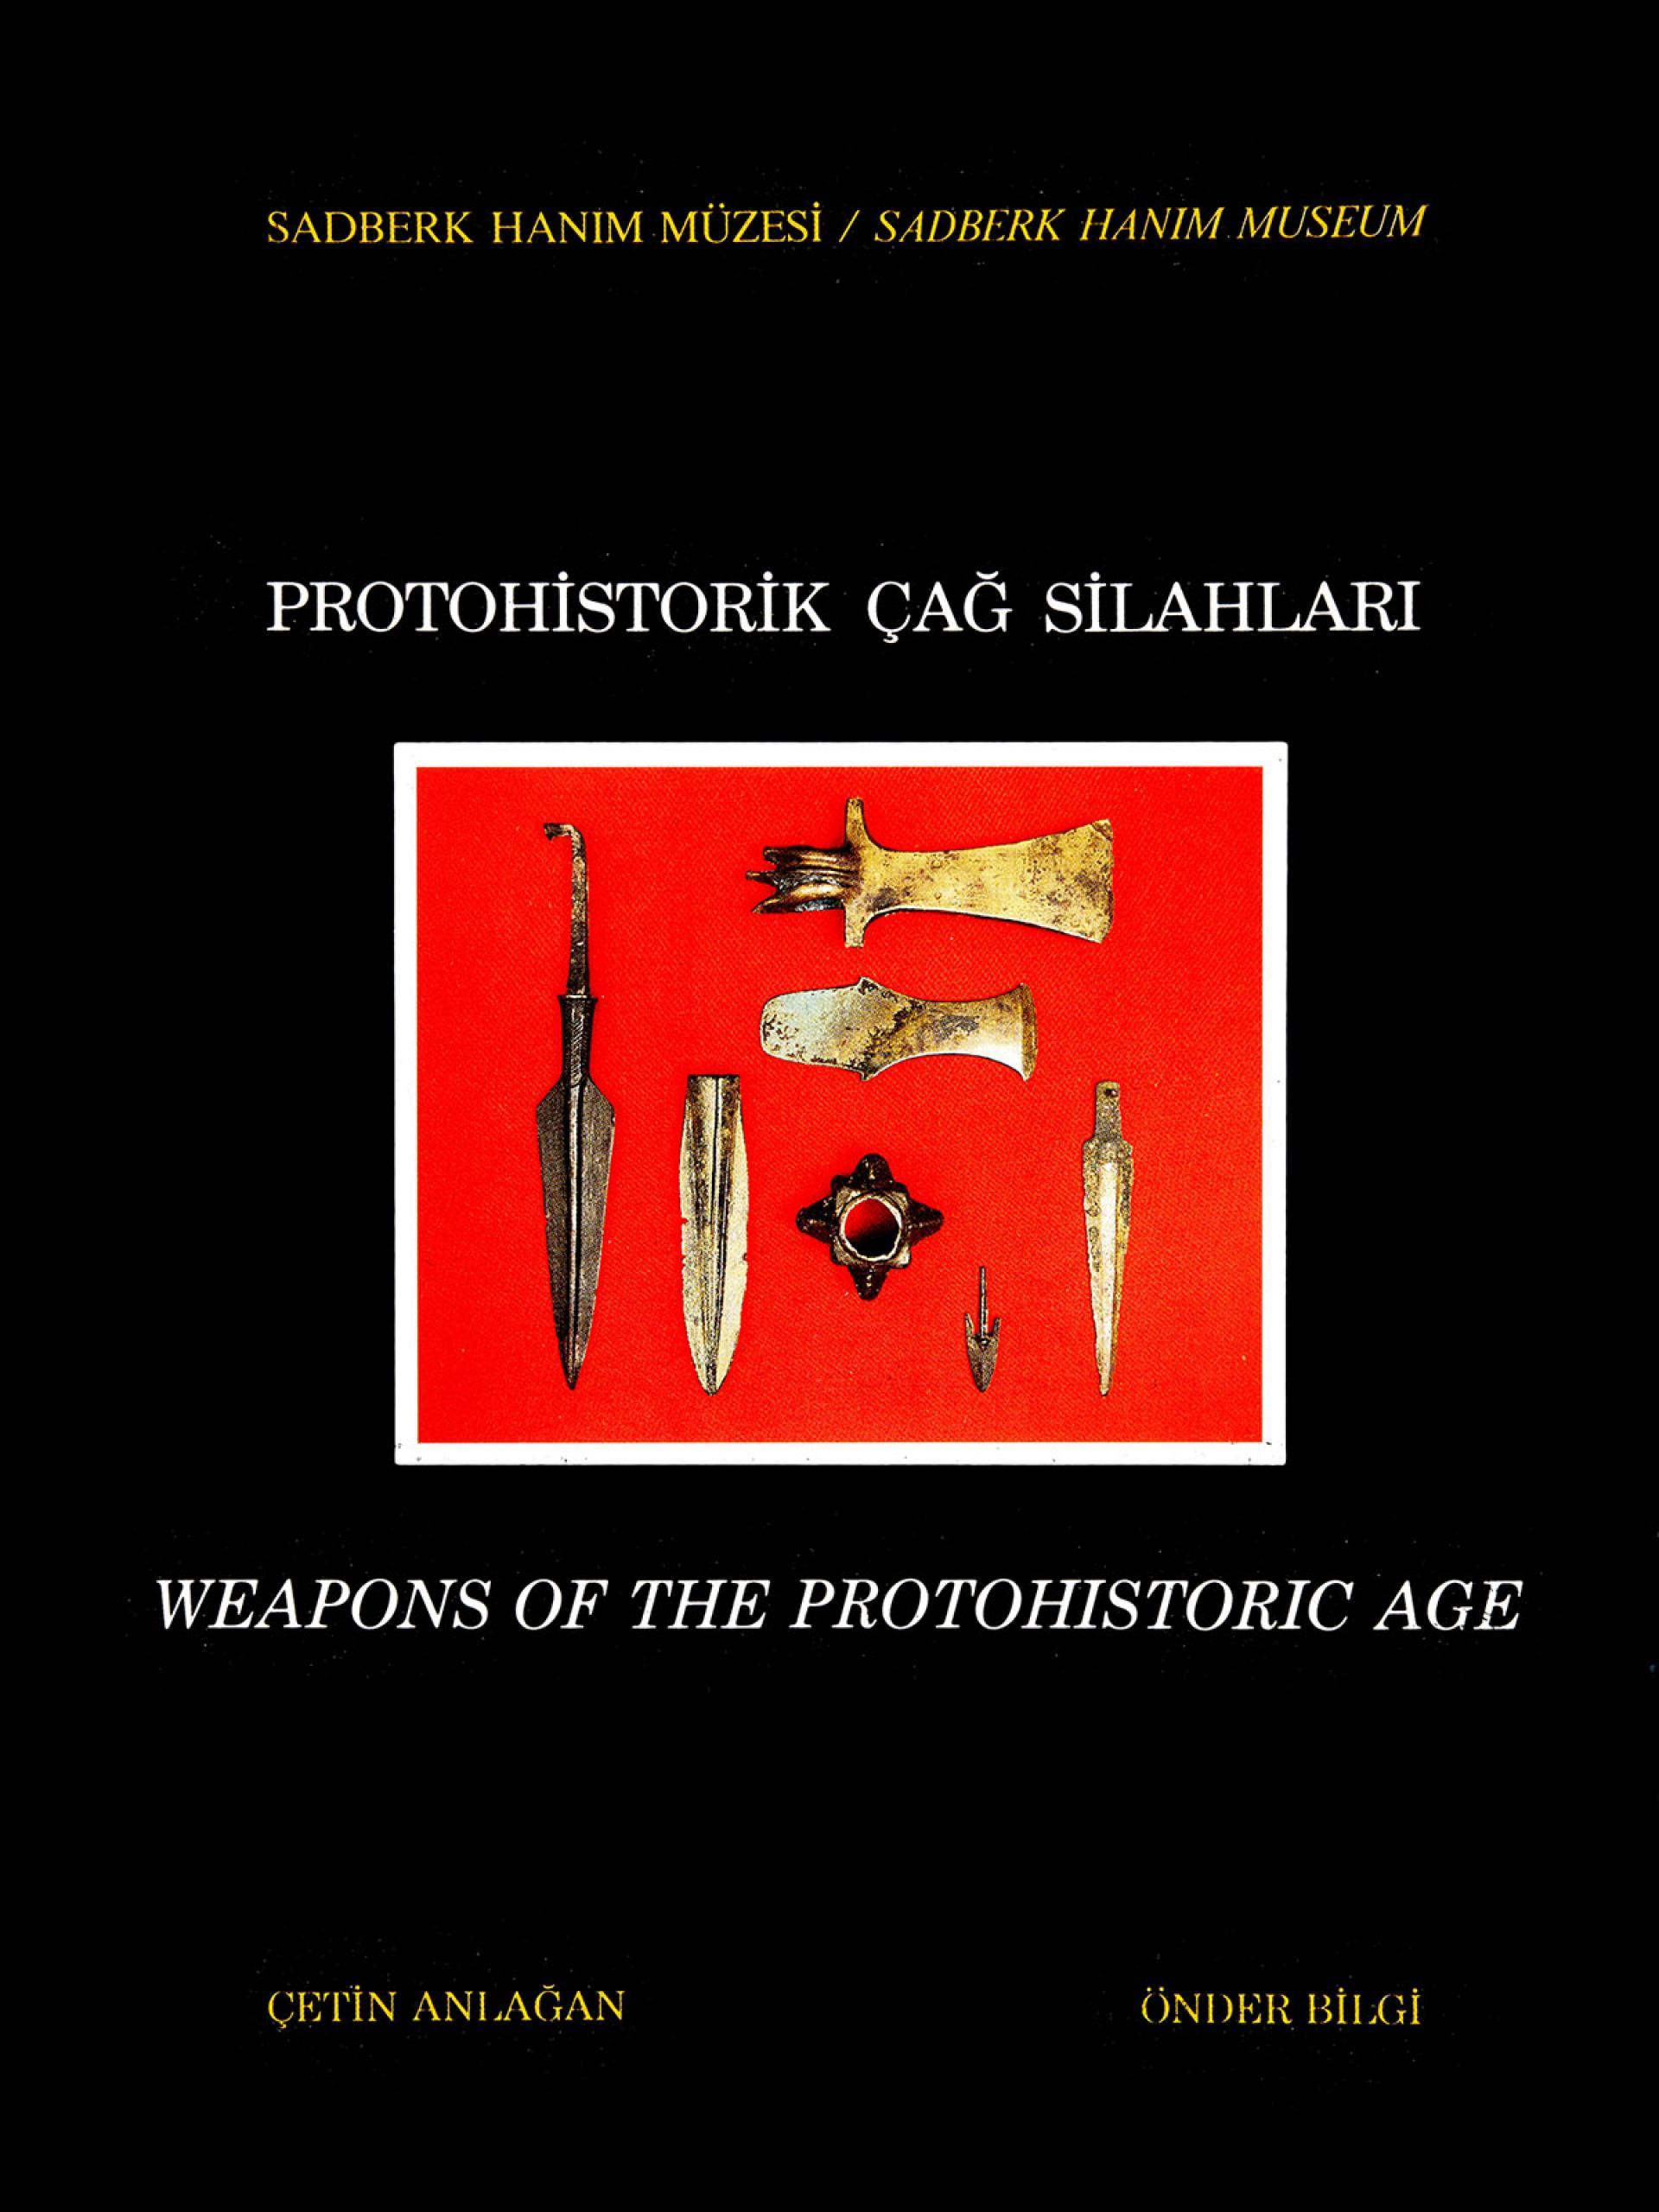 Weapons of the Protohistoric Age - BOOKS - Sadberk Hanım Museum